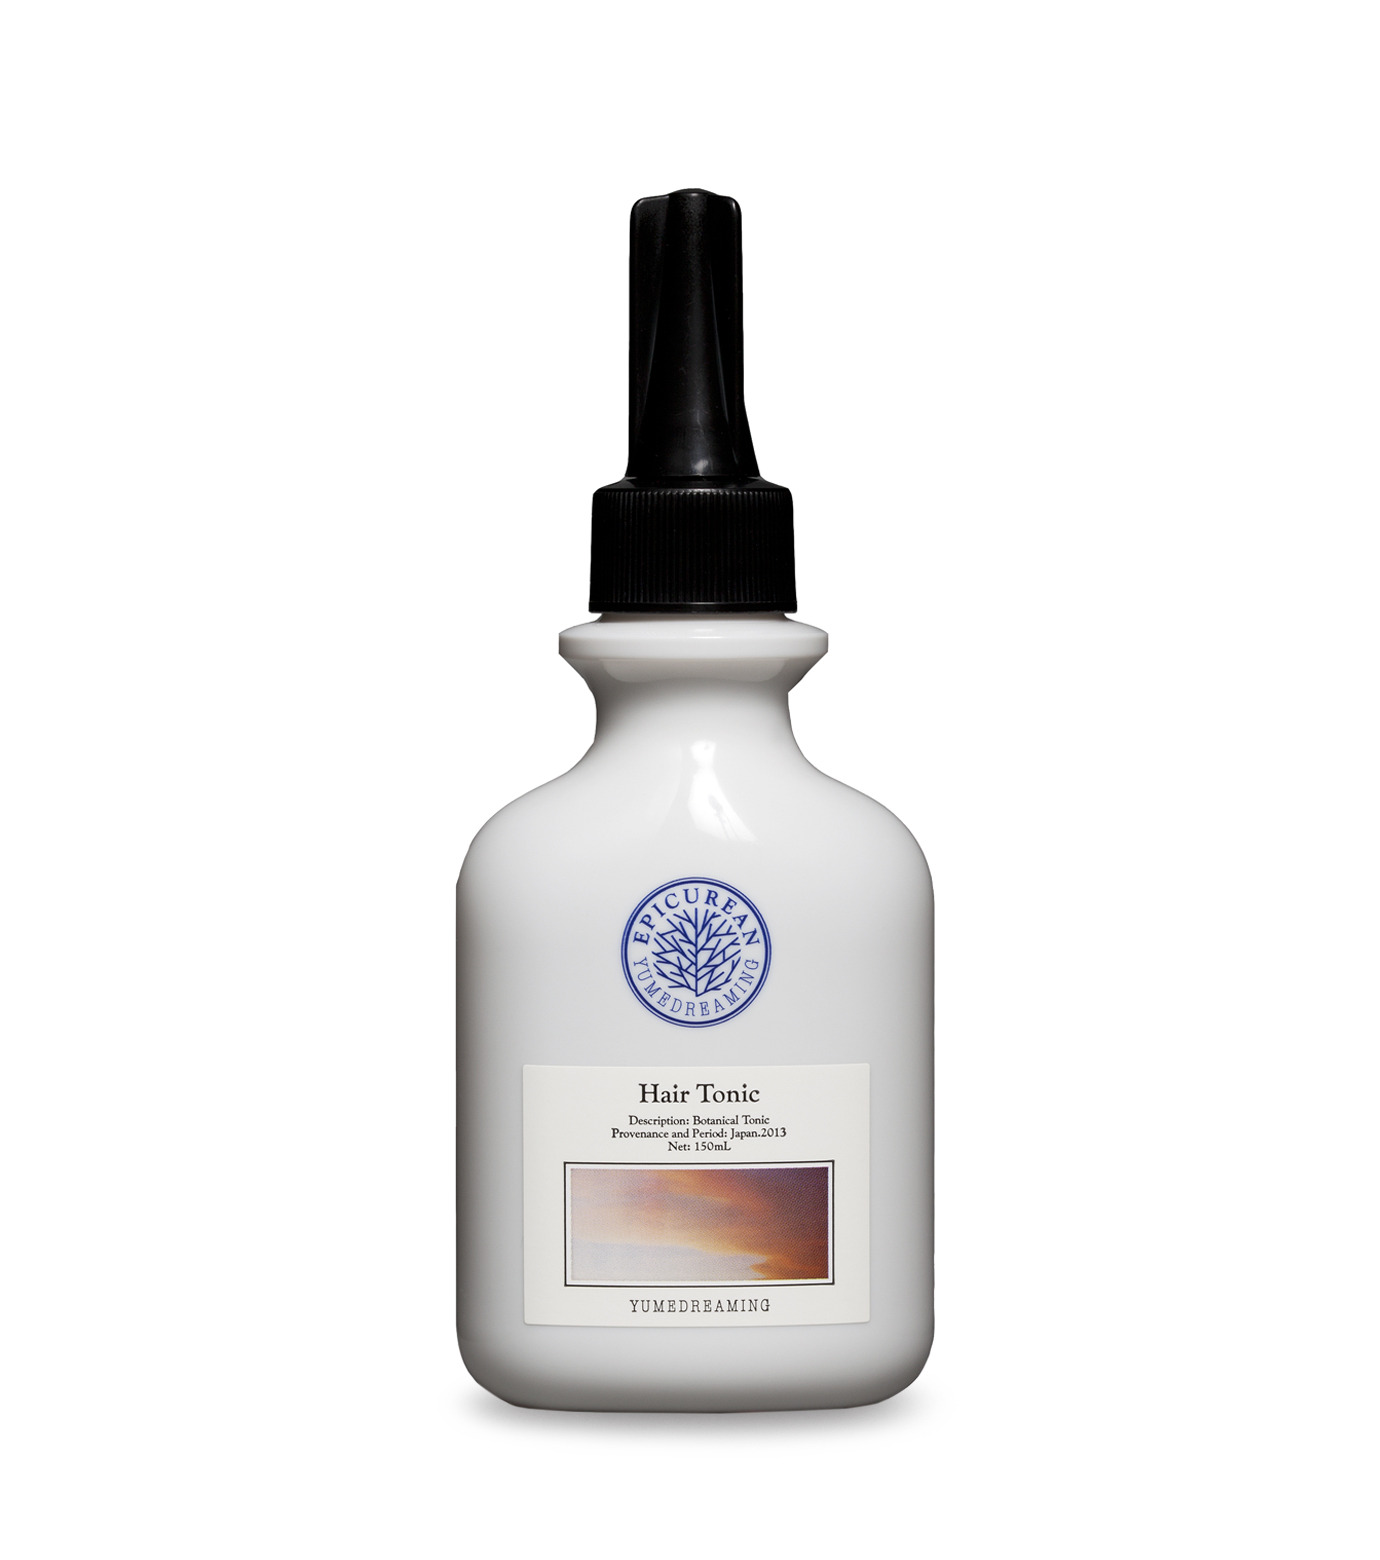 Yumedreaming Epicurean(ユメドリーミン エピキュリアン)のHair Tonic 150ml-WHITE(HAIR-CARE/HAIR-CARE)-EHT-4 拡大詳細画像1